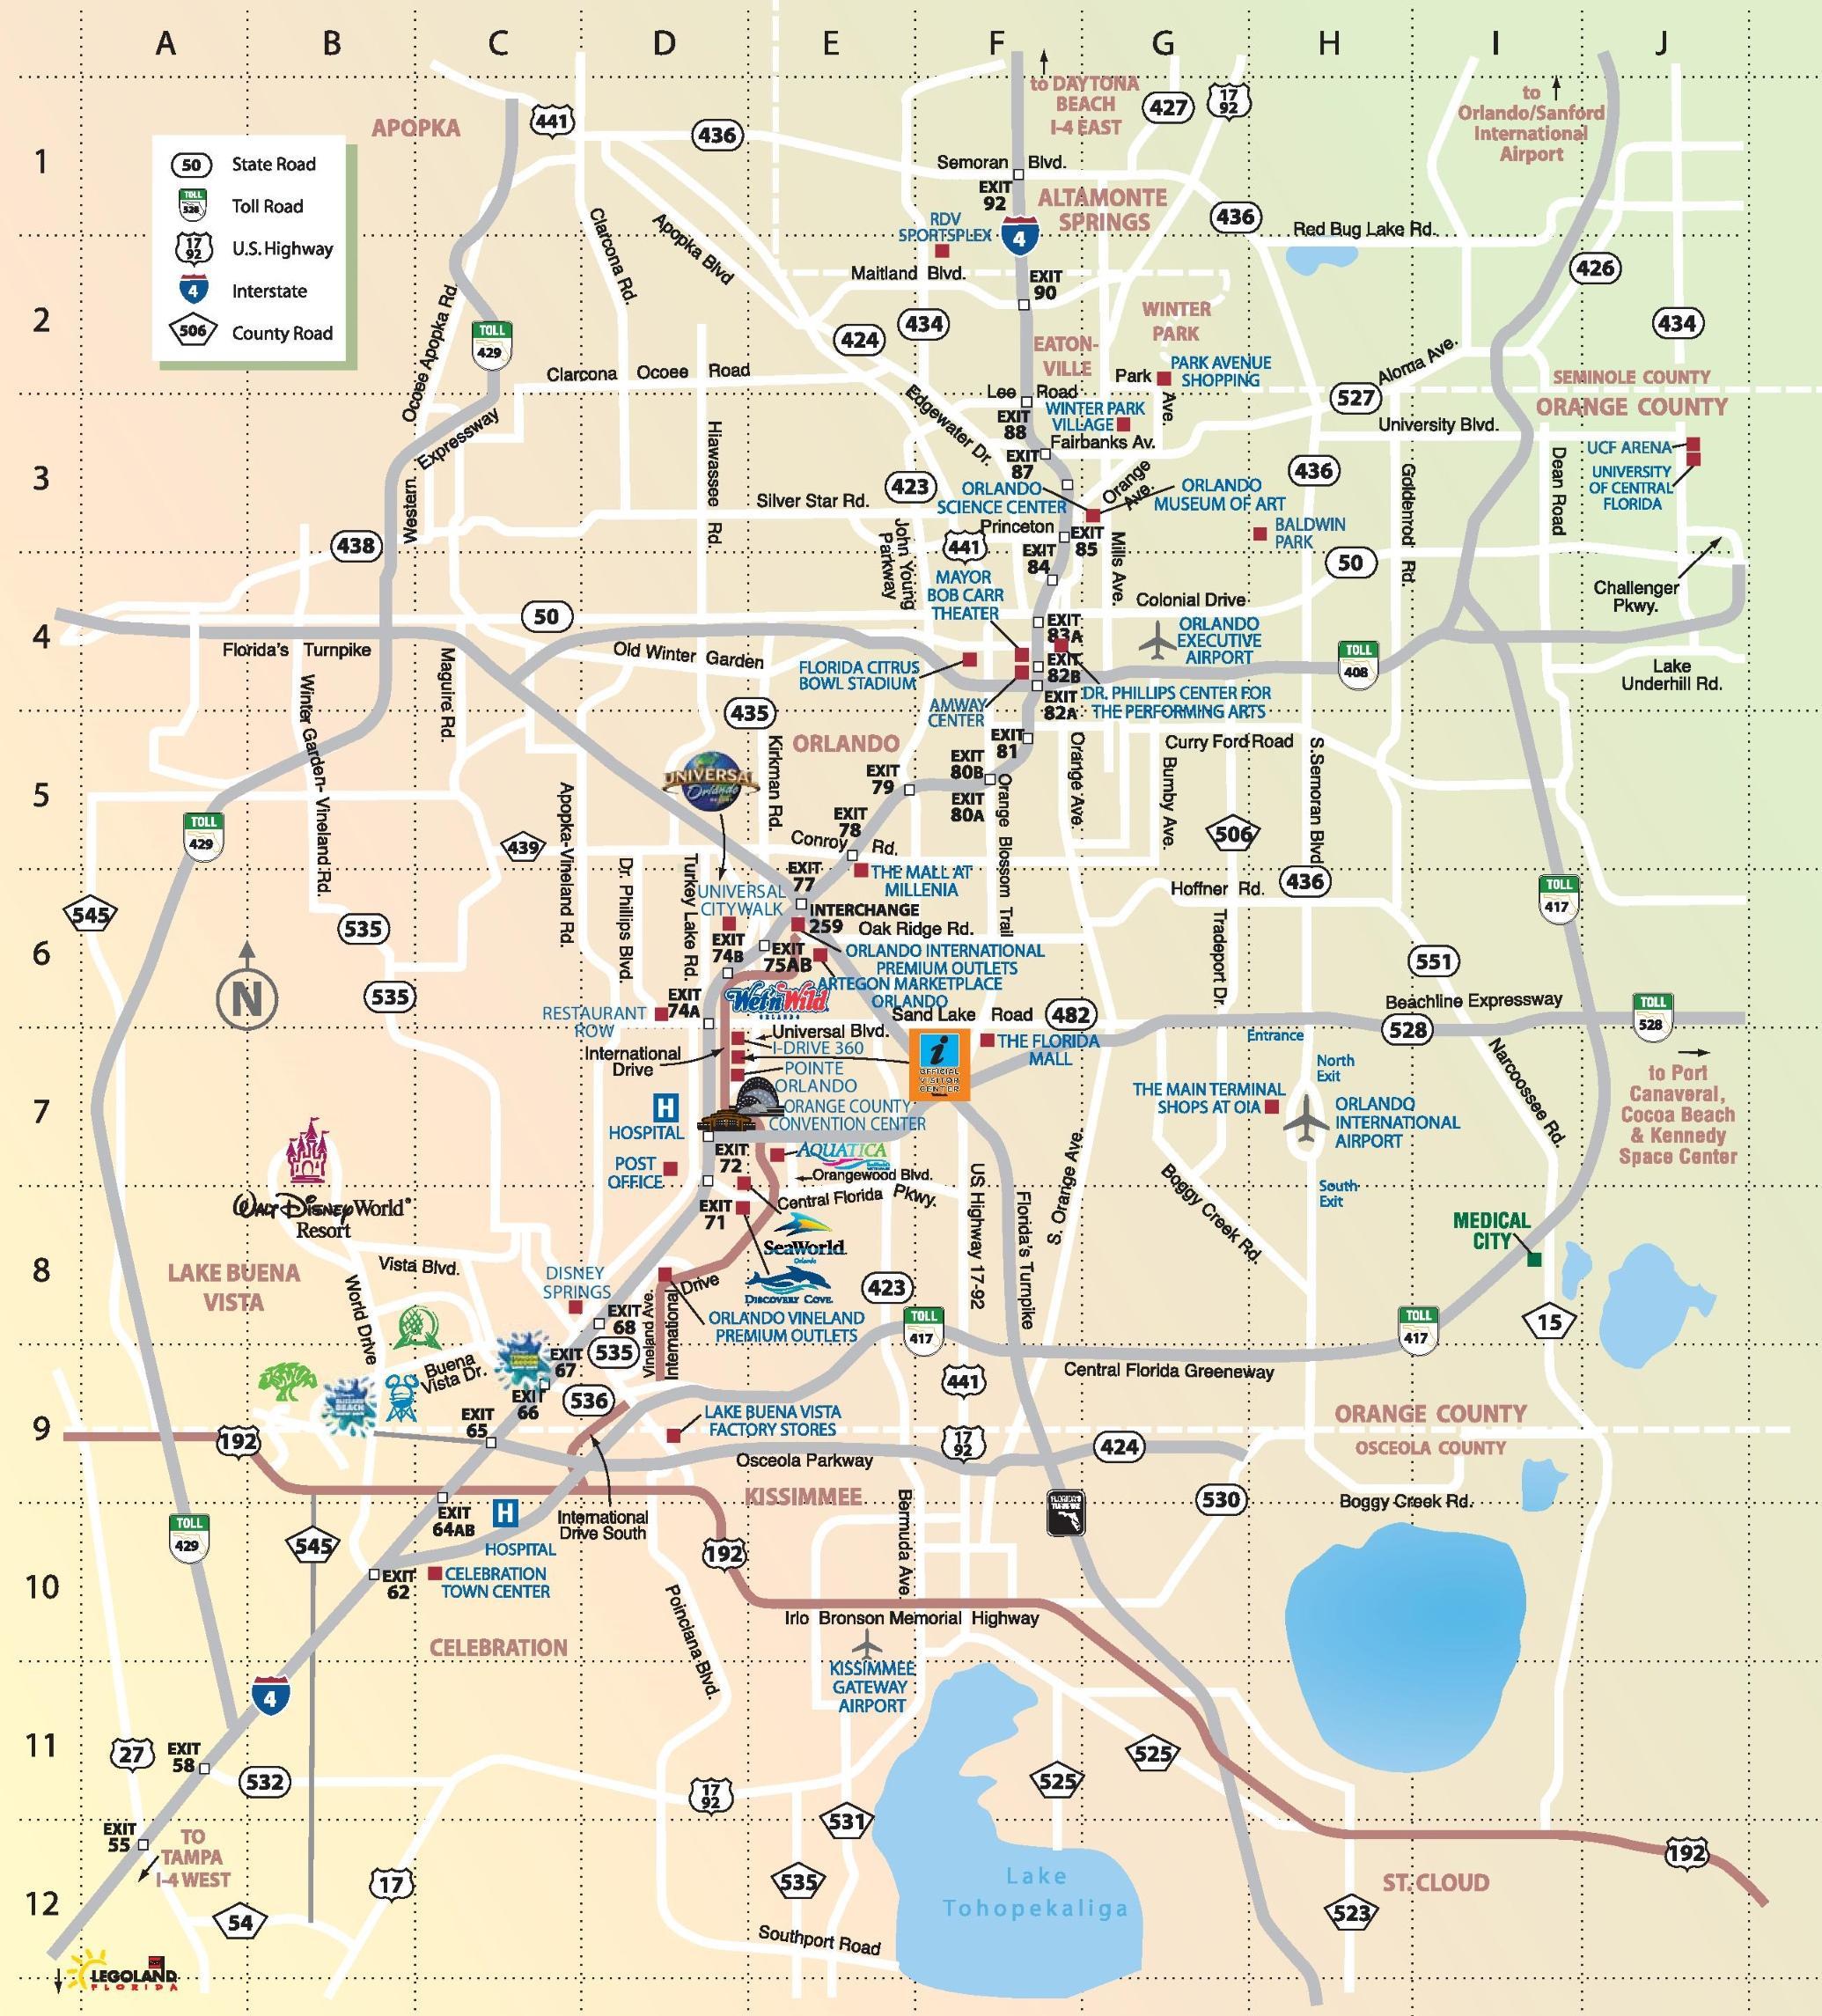 Map Of Orlando Florida - Orlando Florida On Map (Florida - Usa) - Map Of Orlando Florida Area